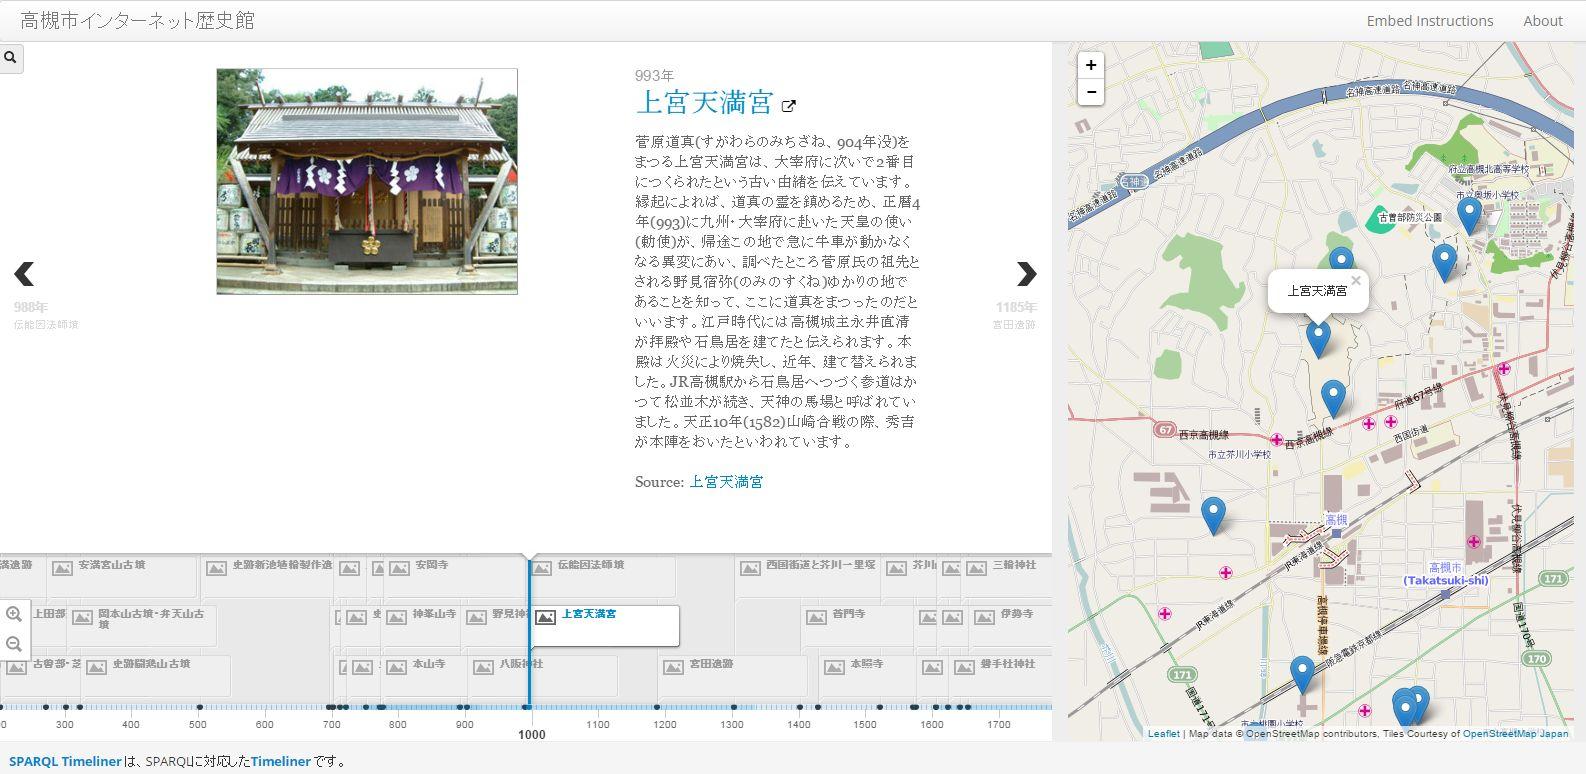 iodd2015_app_takatsuki_history_map